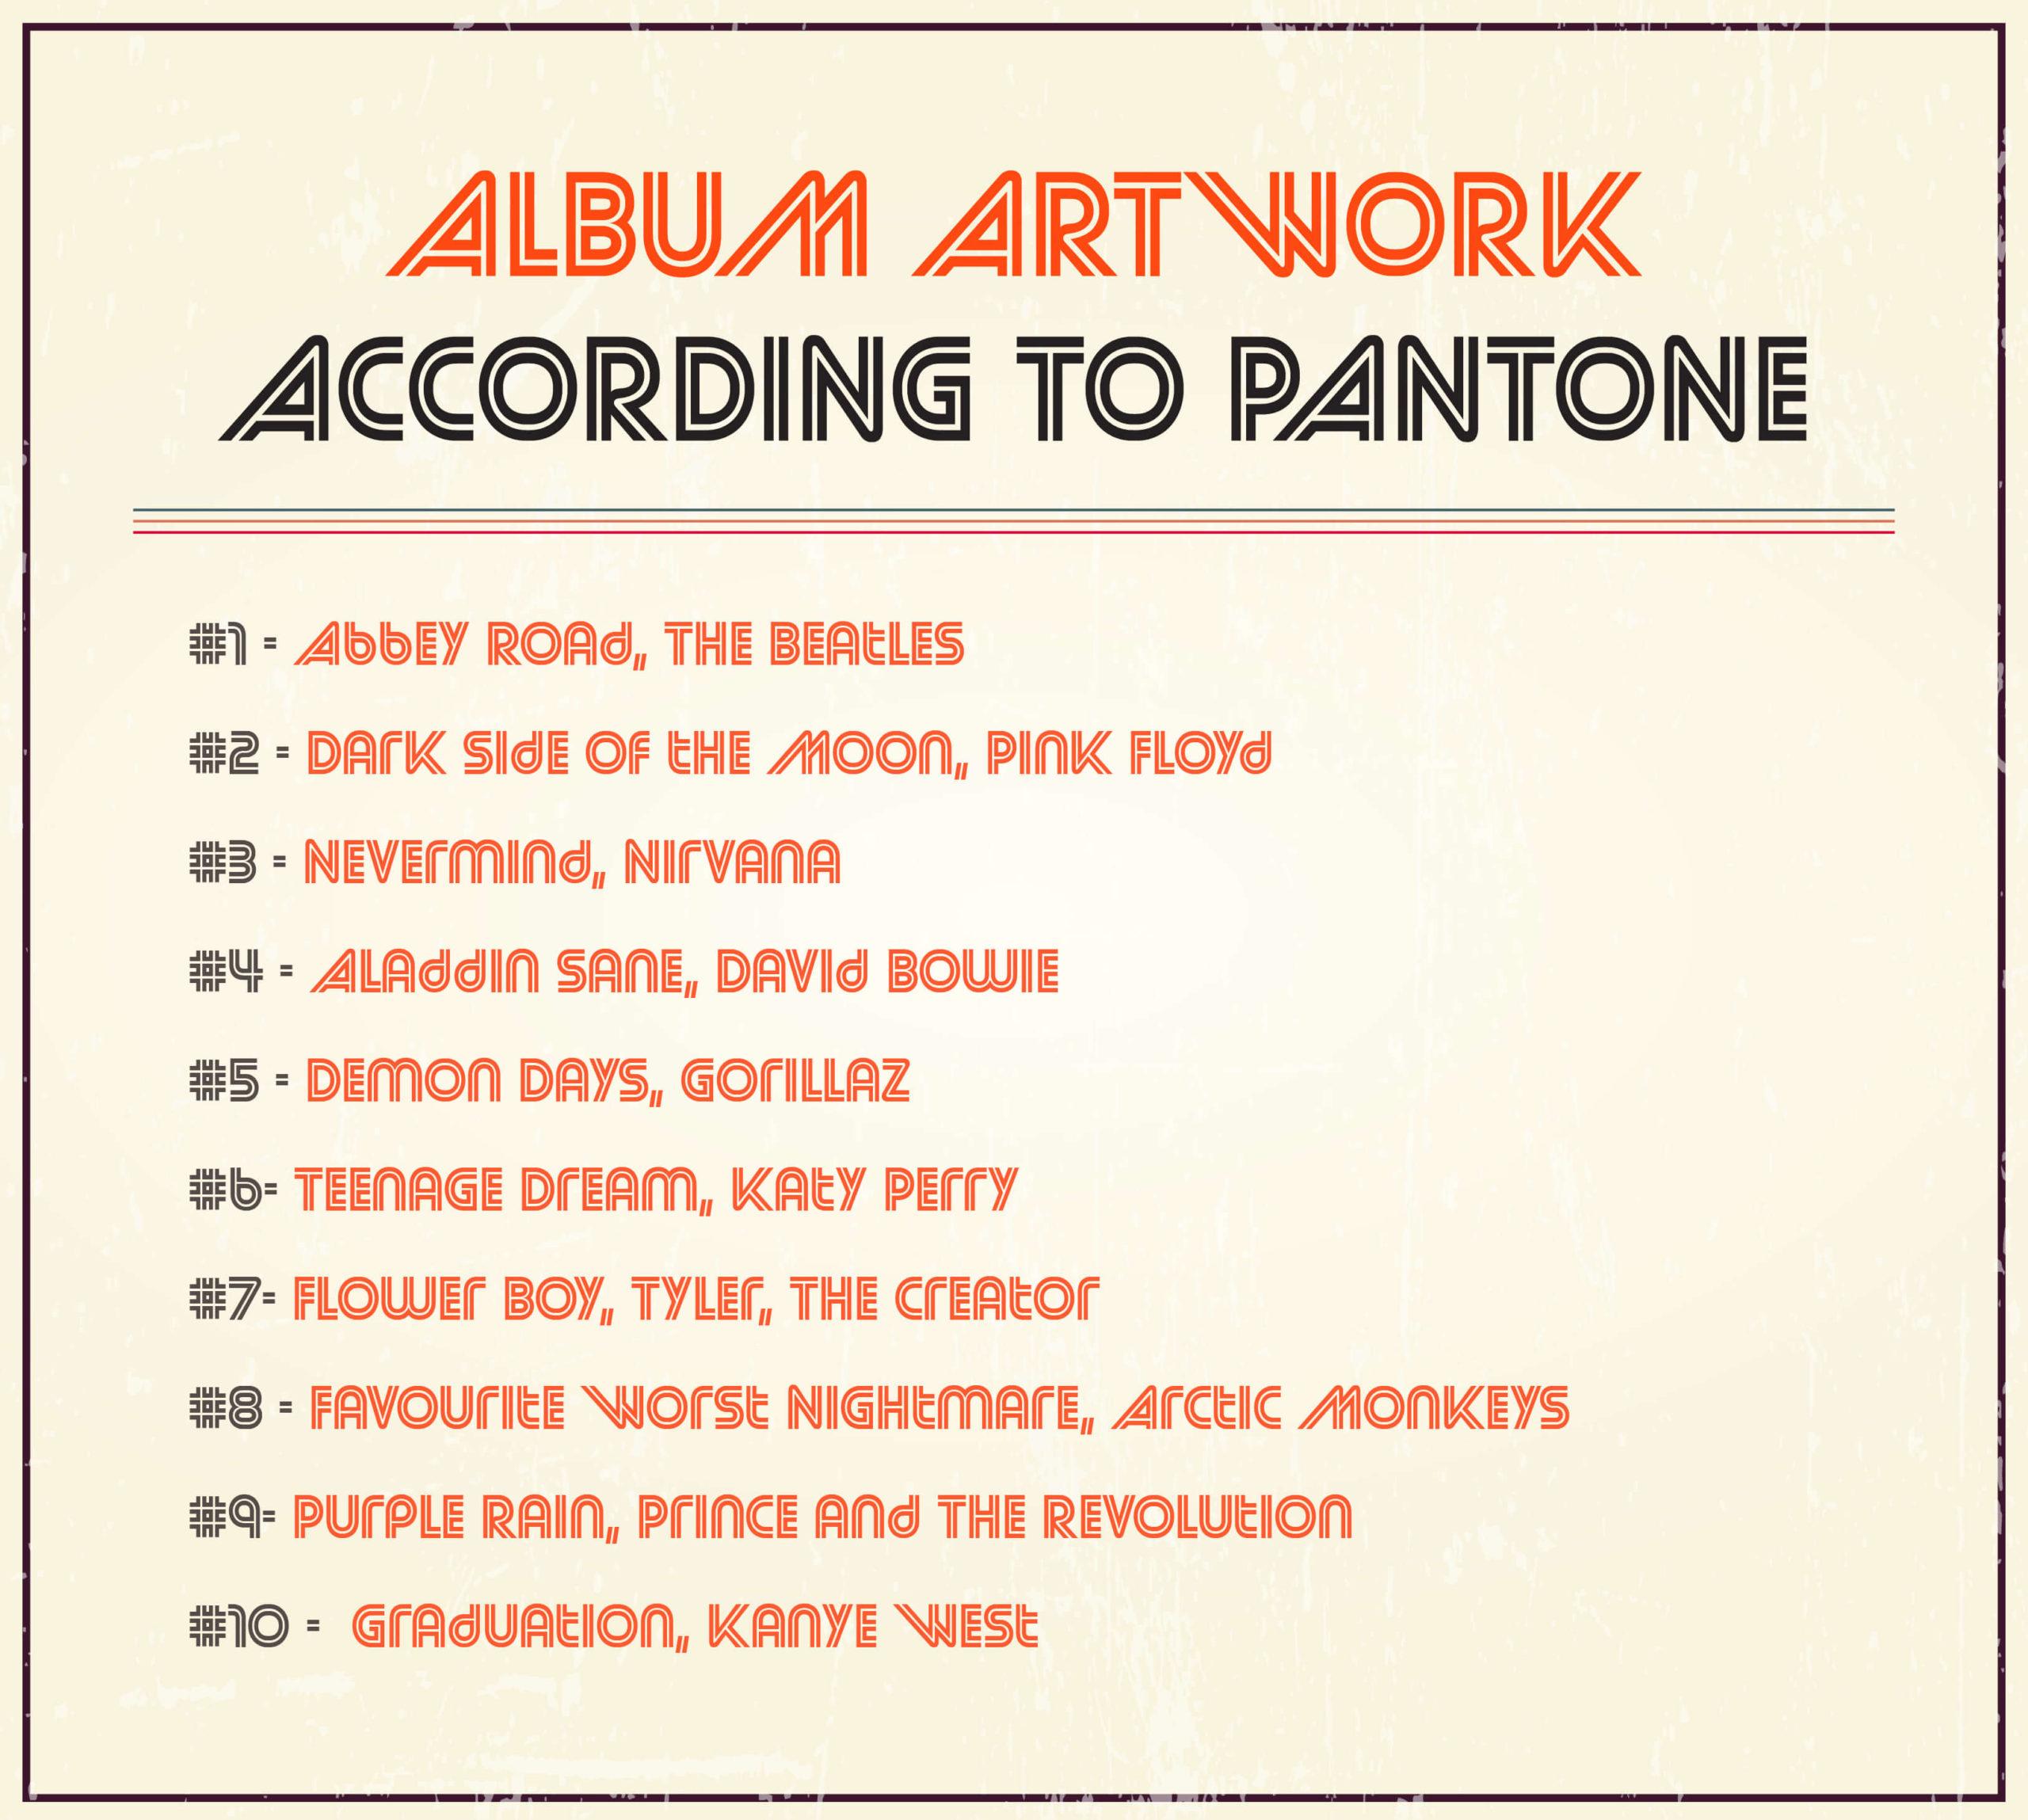 Album Artwork As Pantone: Famous Album Covers Without Text Quiz_Answers